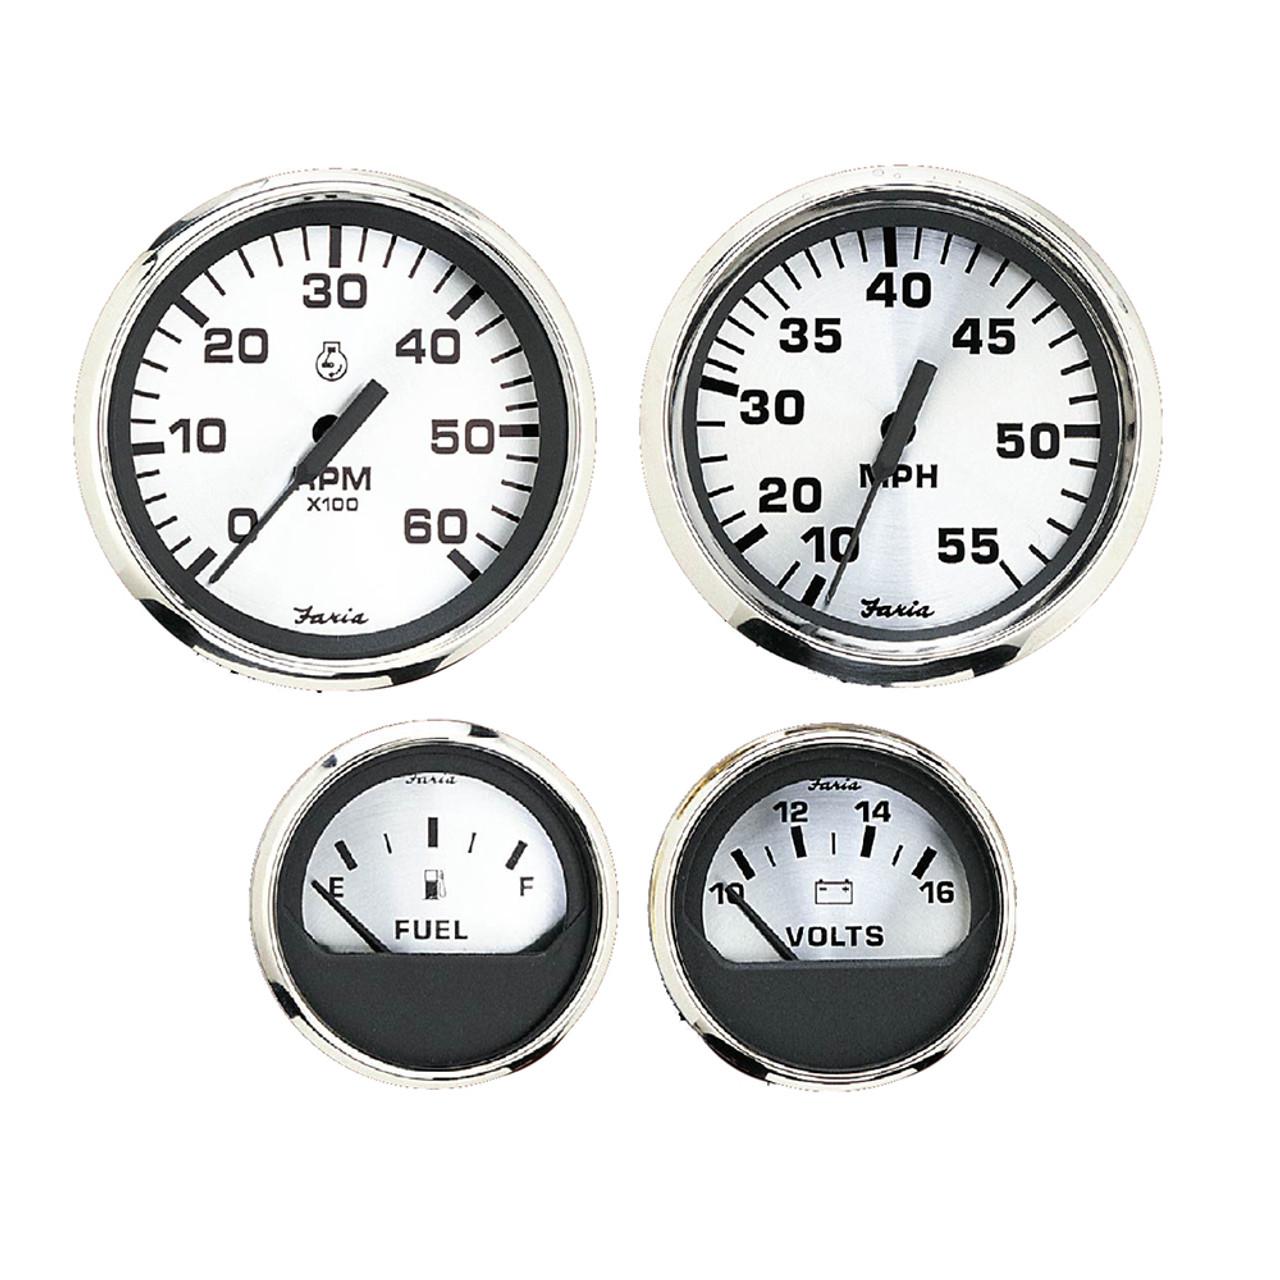 FARIA Spun Silver Series Fuel Level Gauge